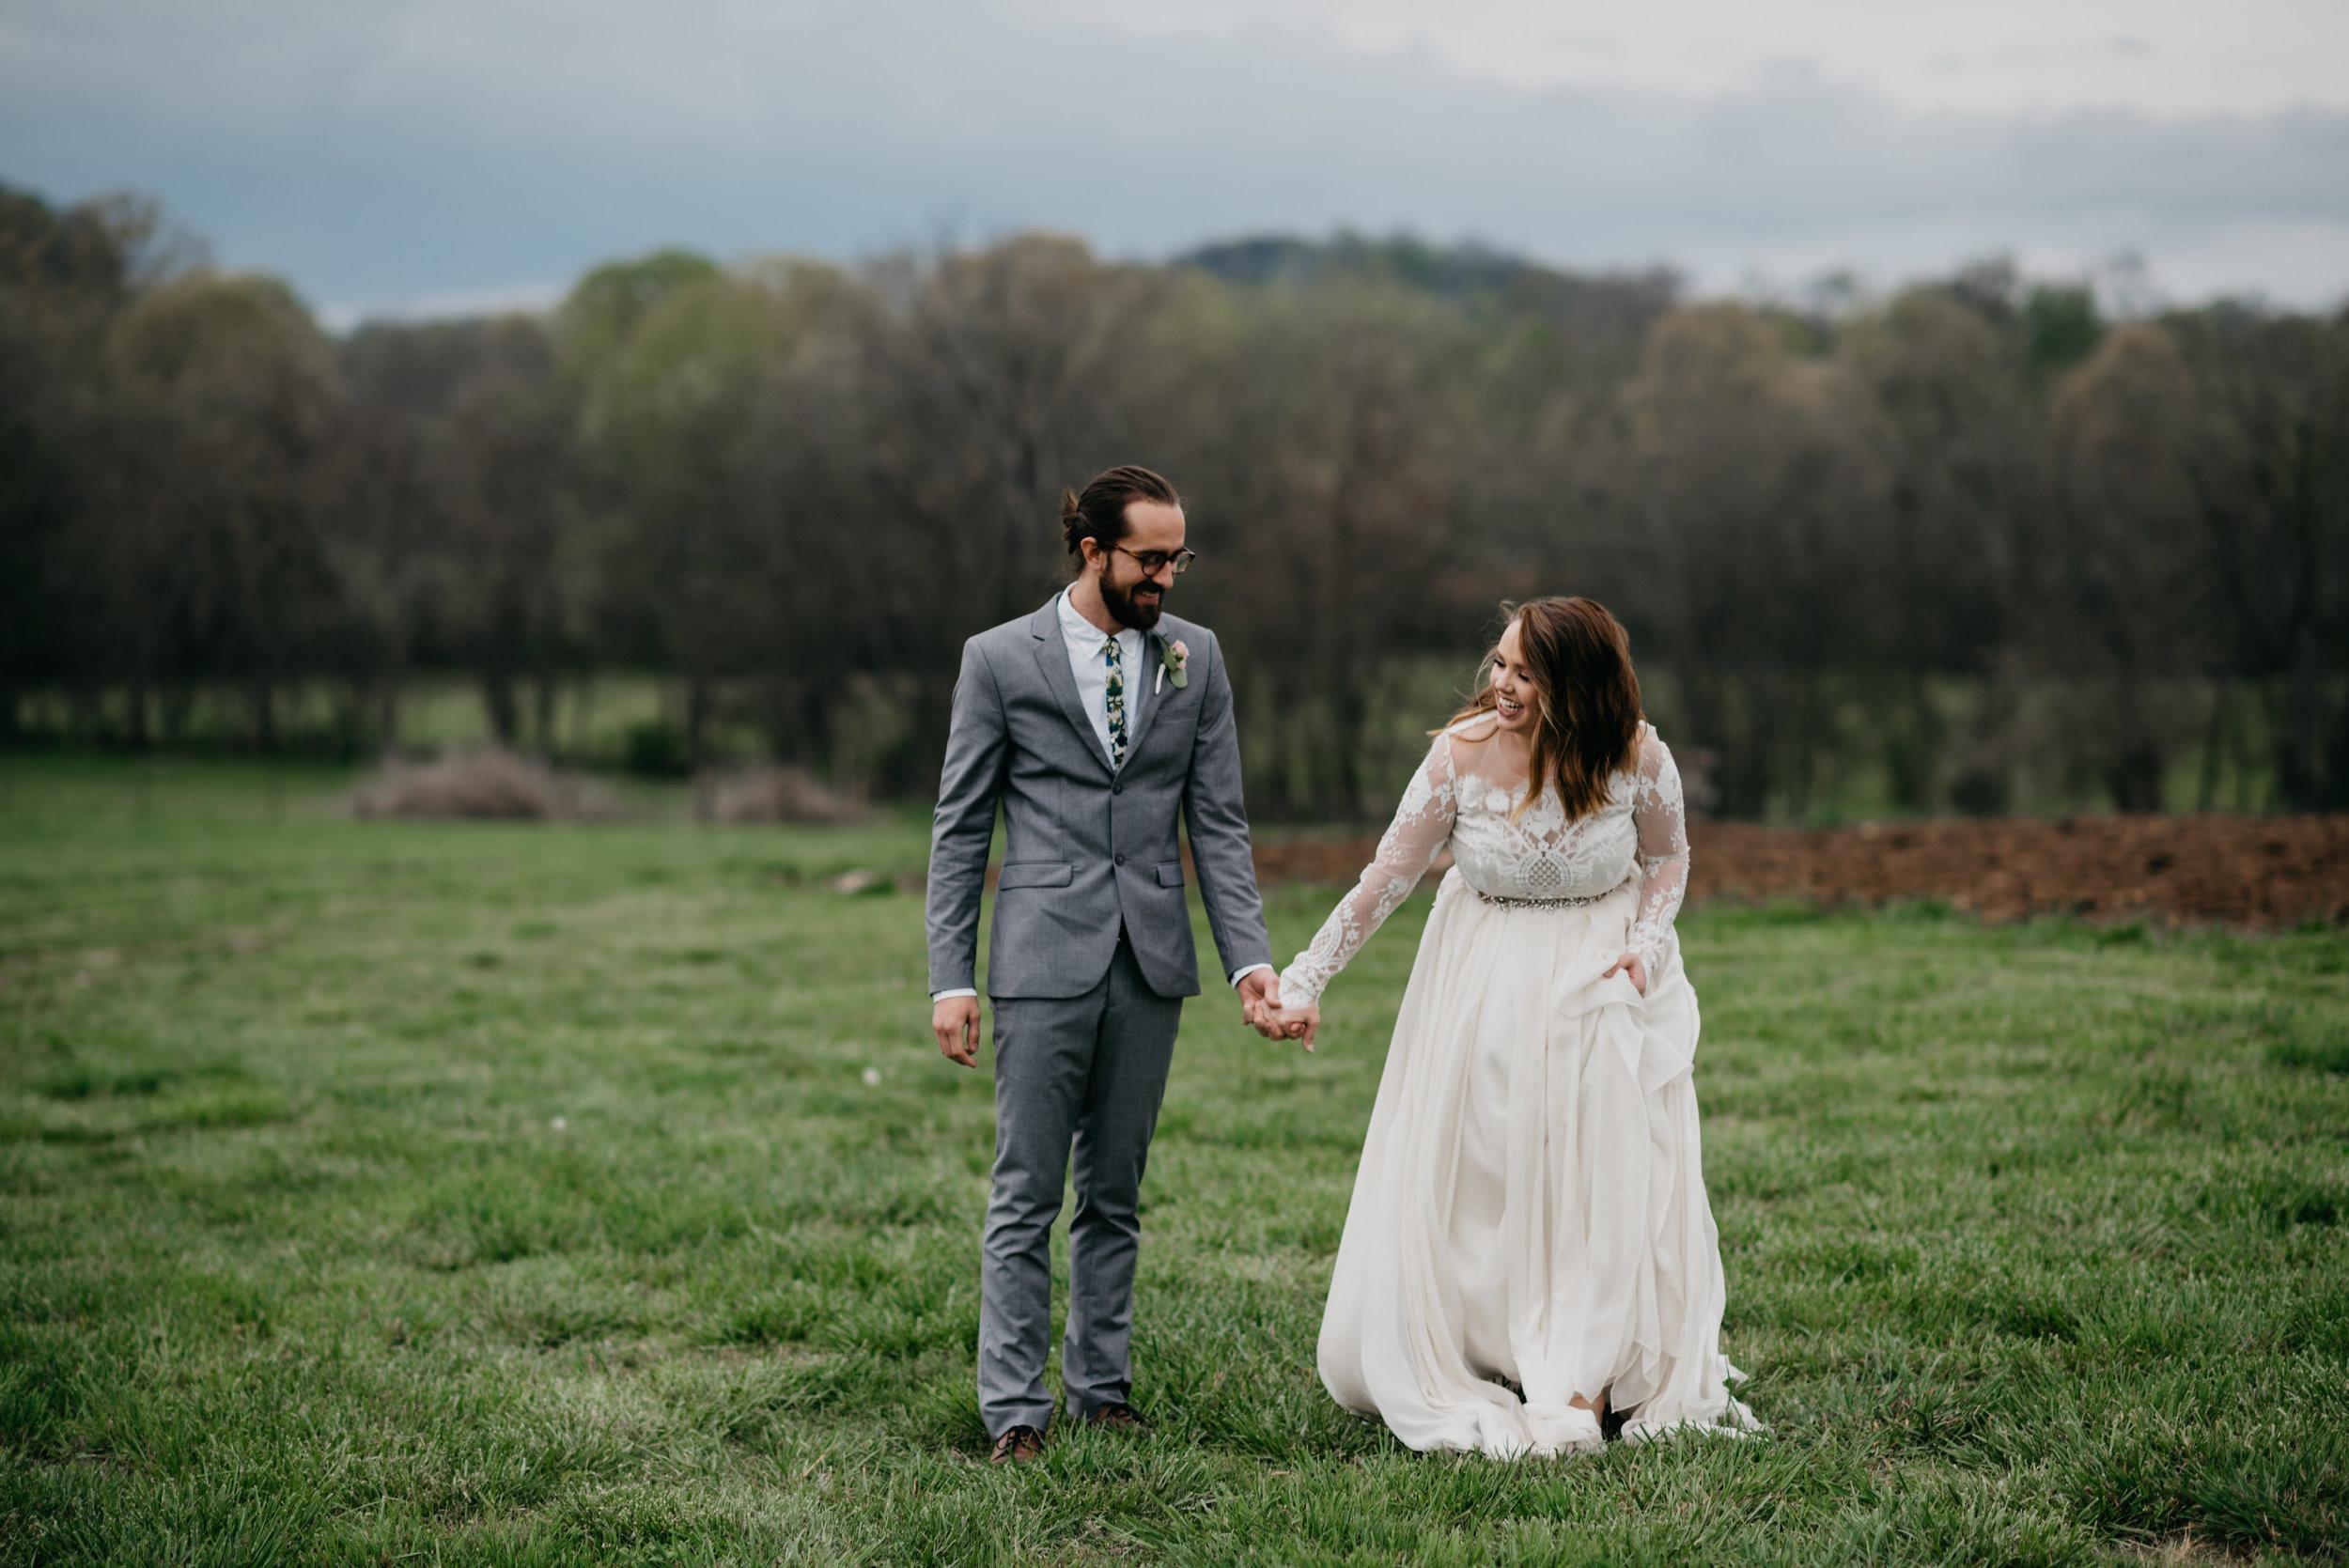 Allenbrooke-Farms-Nashville-Wedding-Photographers 13.jpg